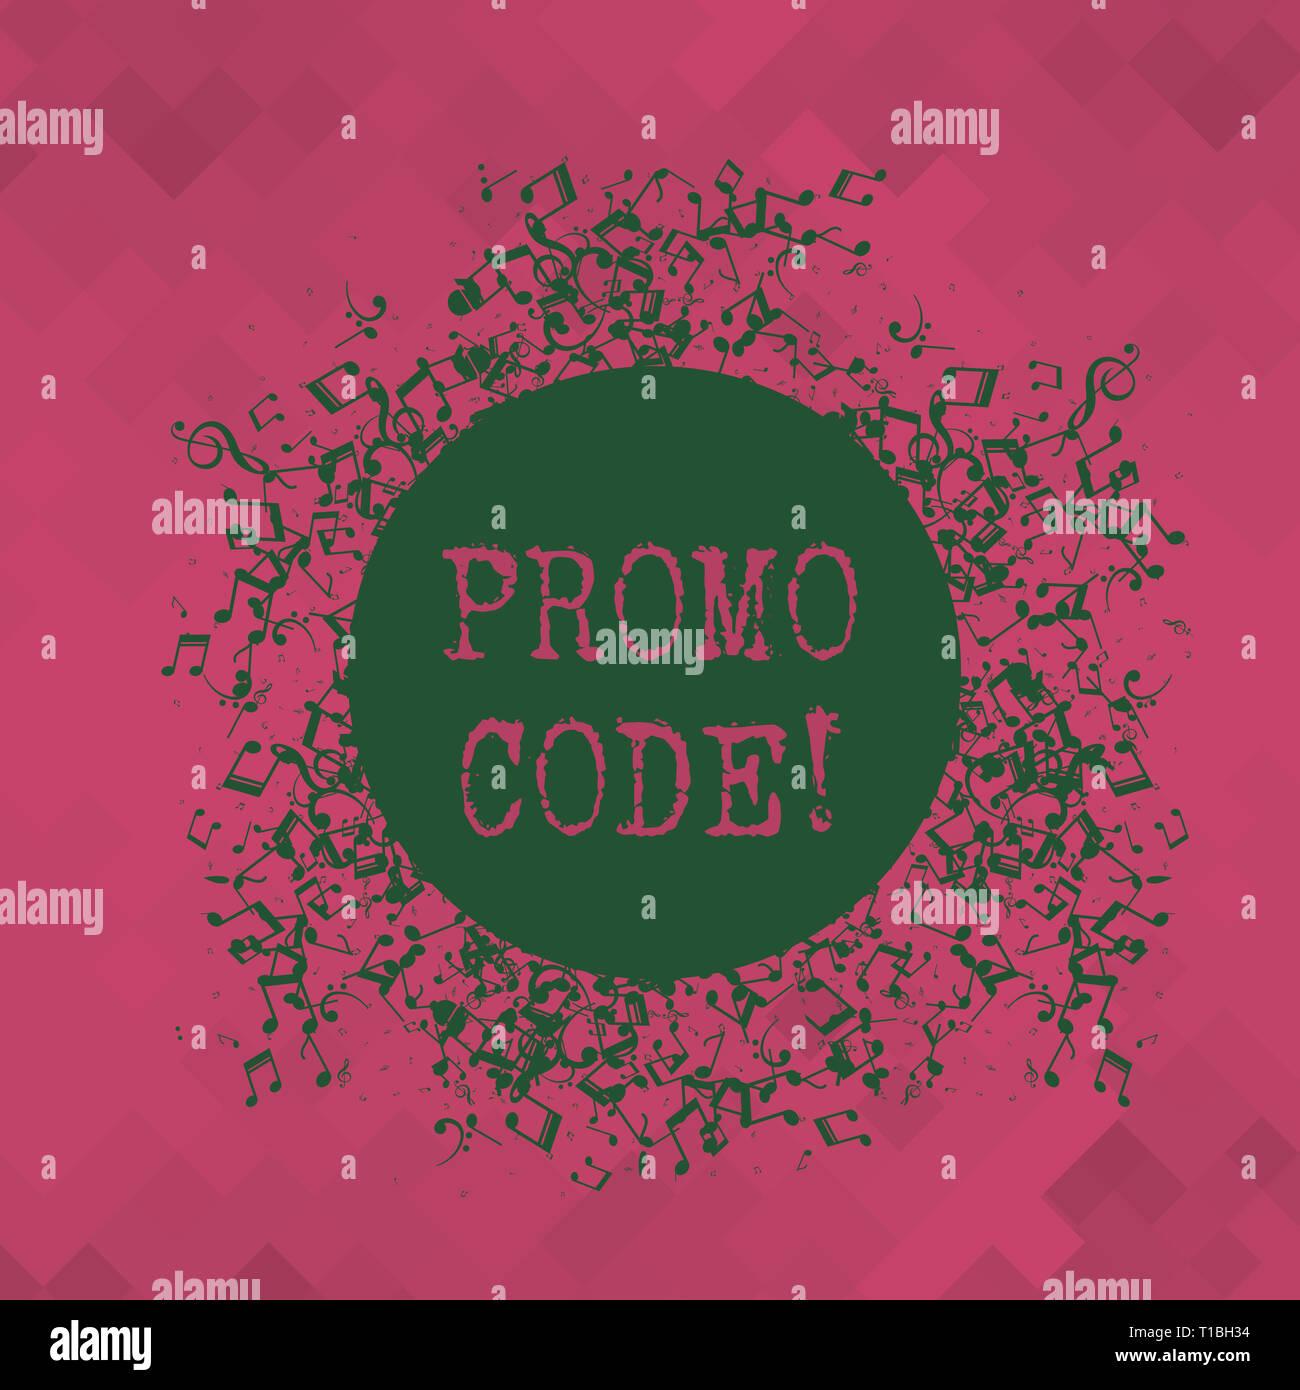 Promo Code Imágenes De Stock Promo Code Fotos De Stock Alamy